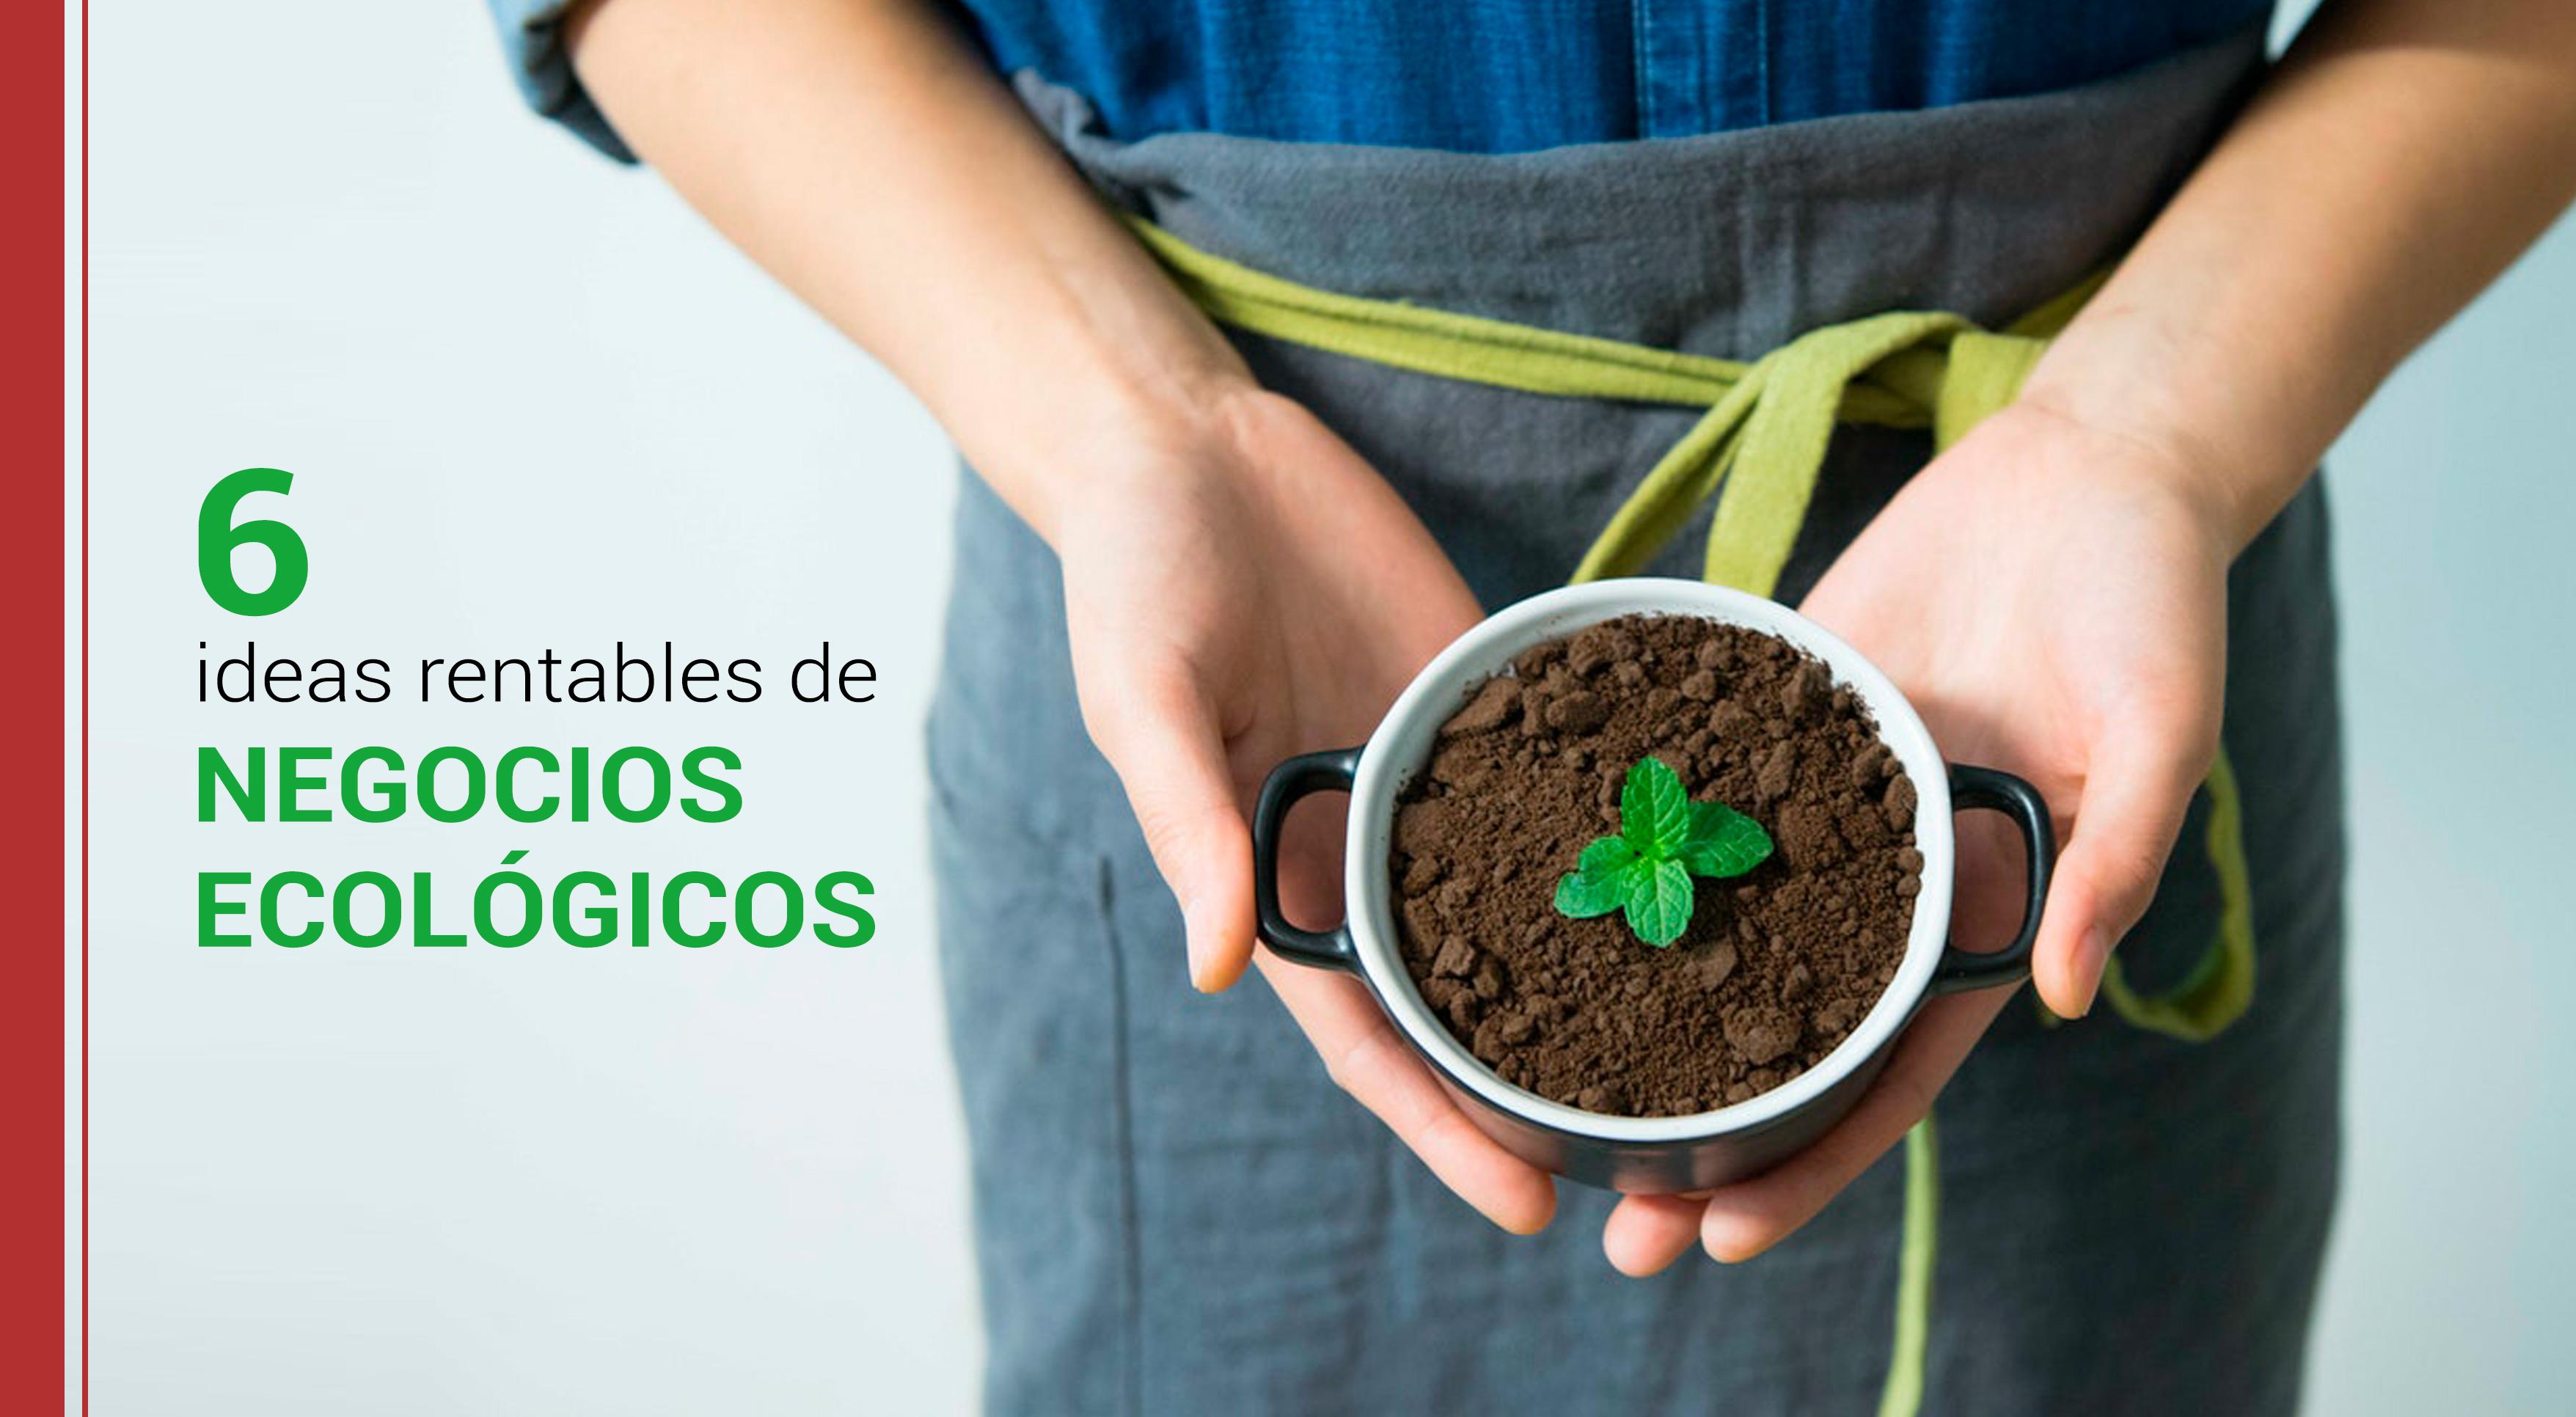 6-ideas-rentables-negocios-ecologicos 6 ideas rentables de negocios ecológicos